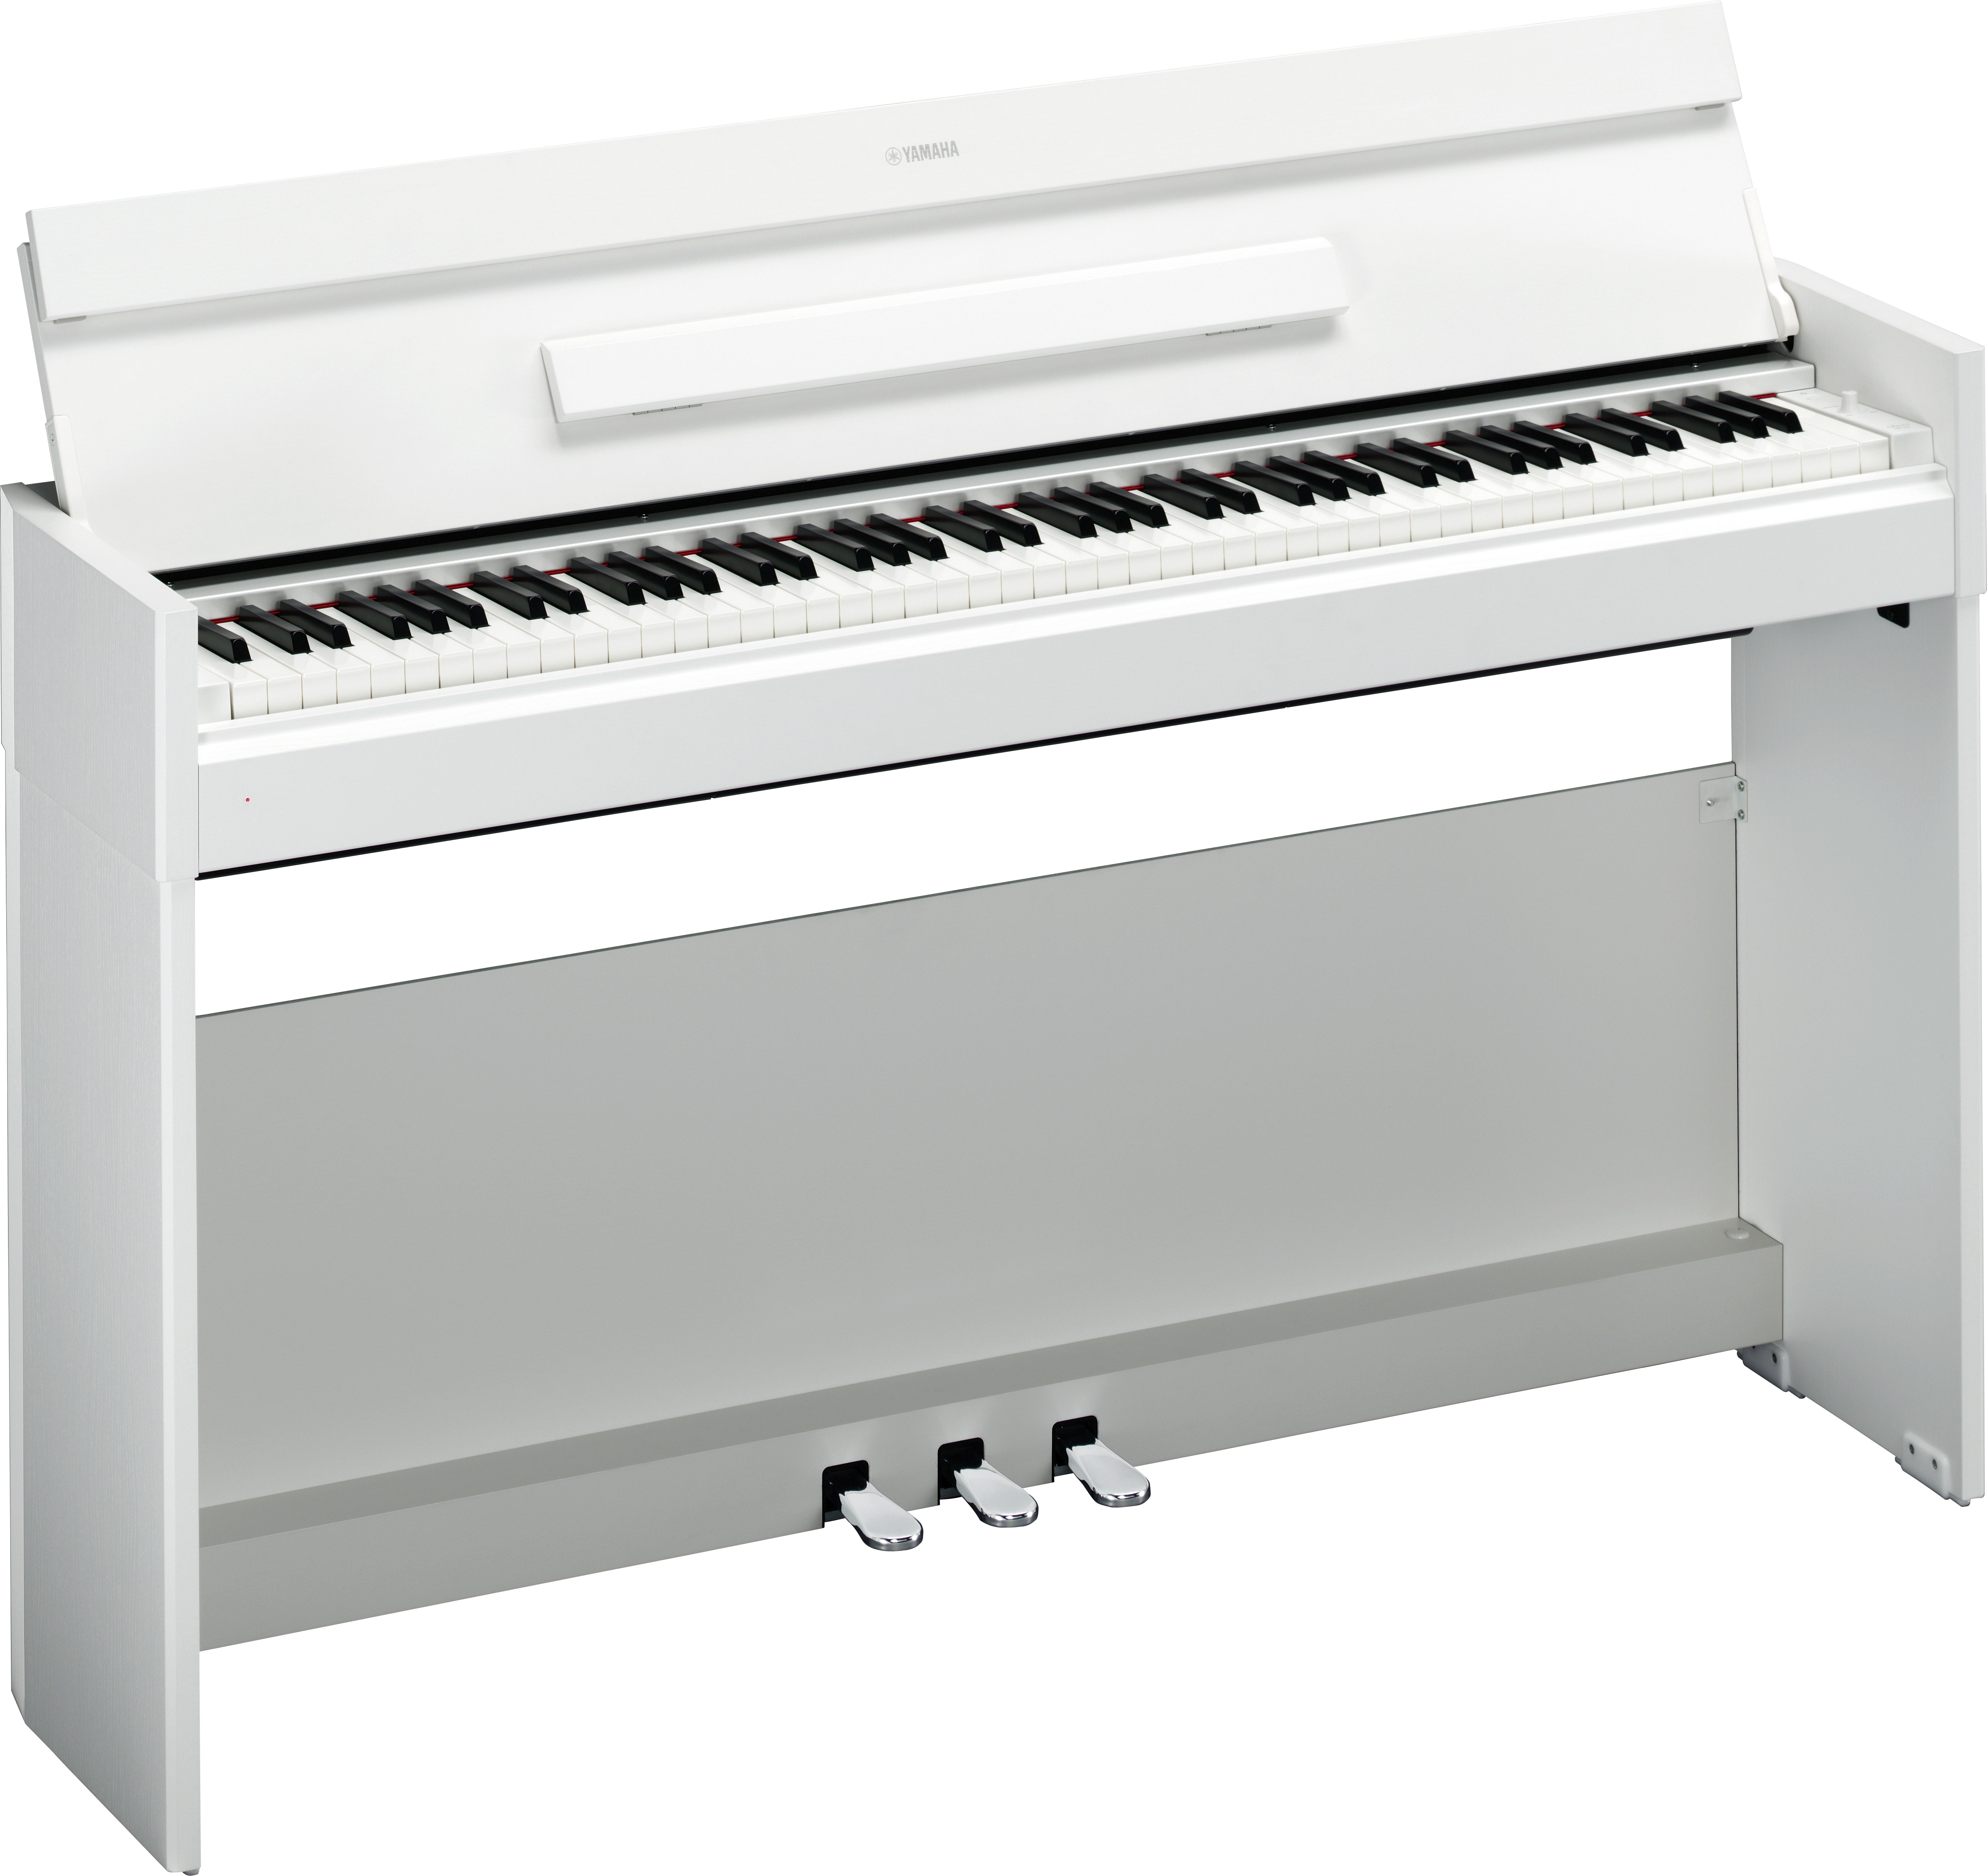 Yamaha arius ydp s52 digital piano a hanna sons for Yamaha ydp 113 for sale